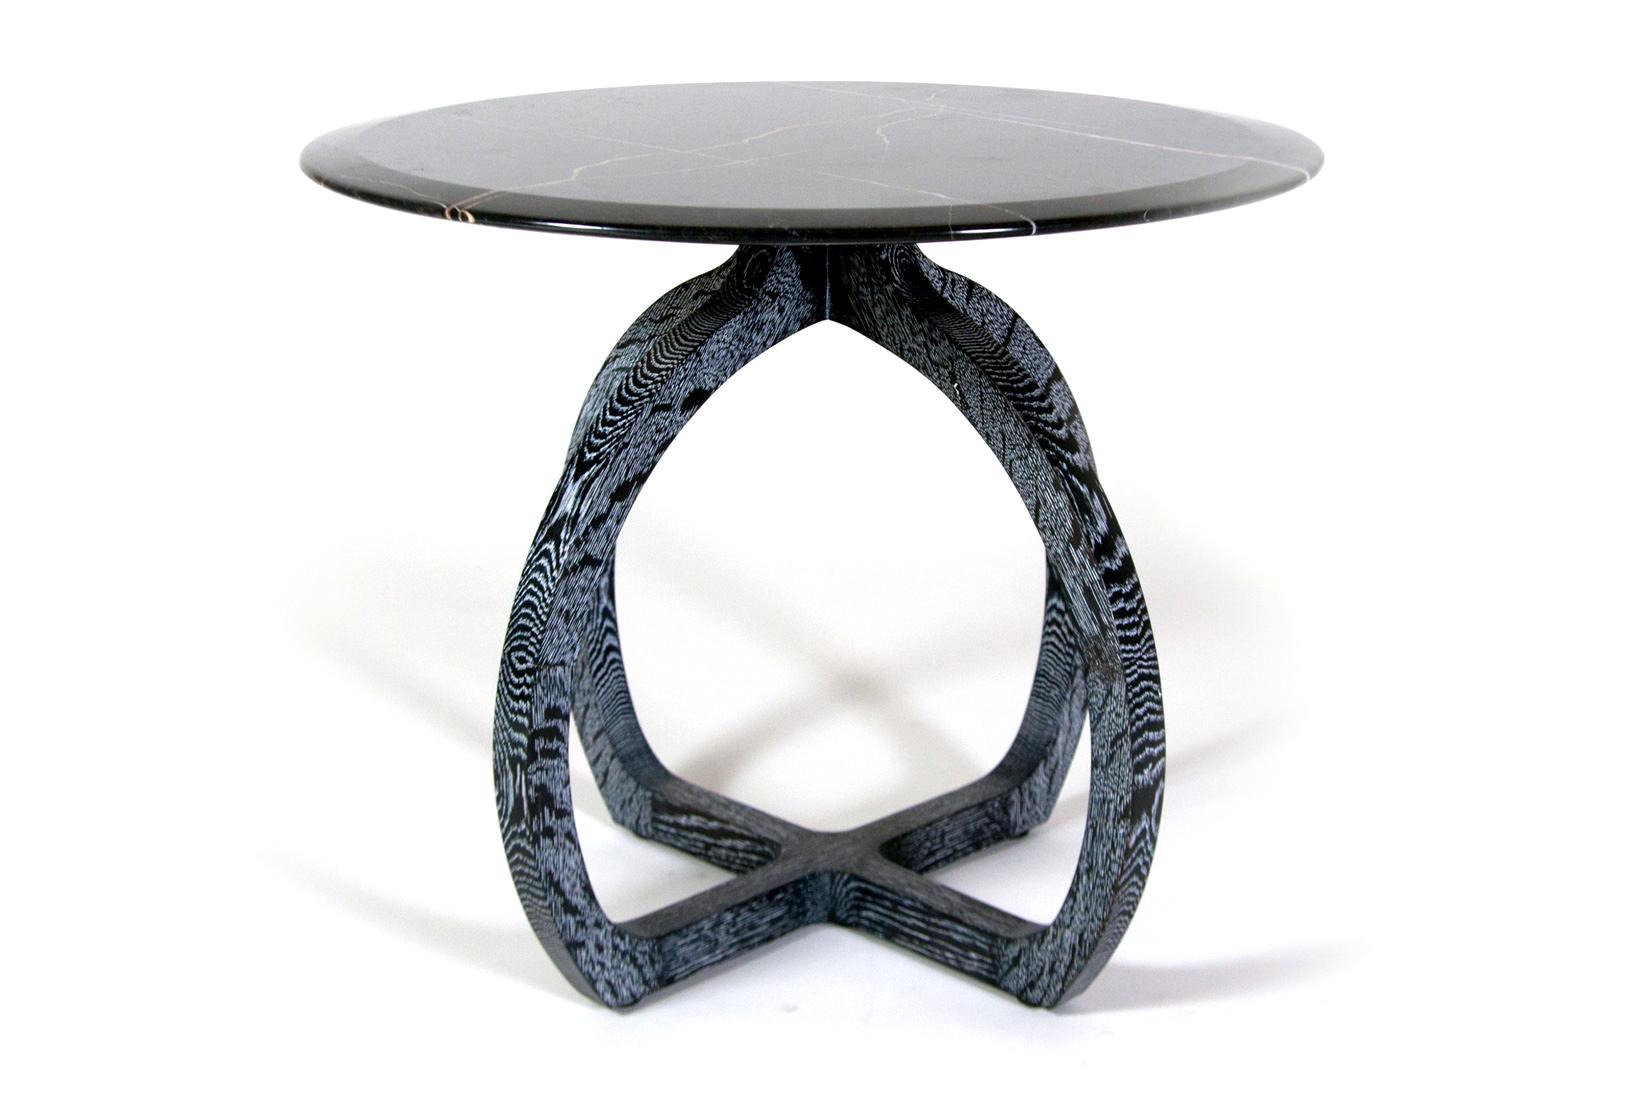 ELLIOT-EAKIN-Furniture---Ceruse-Side-Table---Side-View.jpg